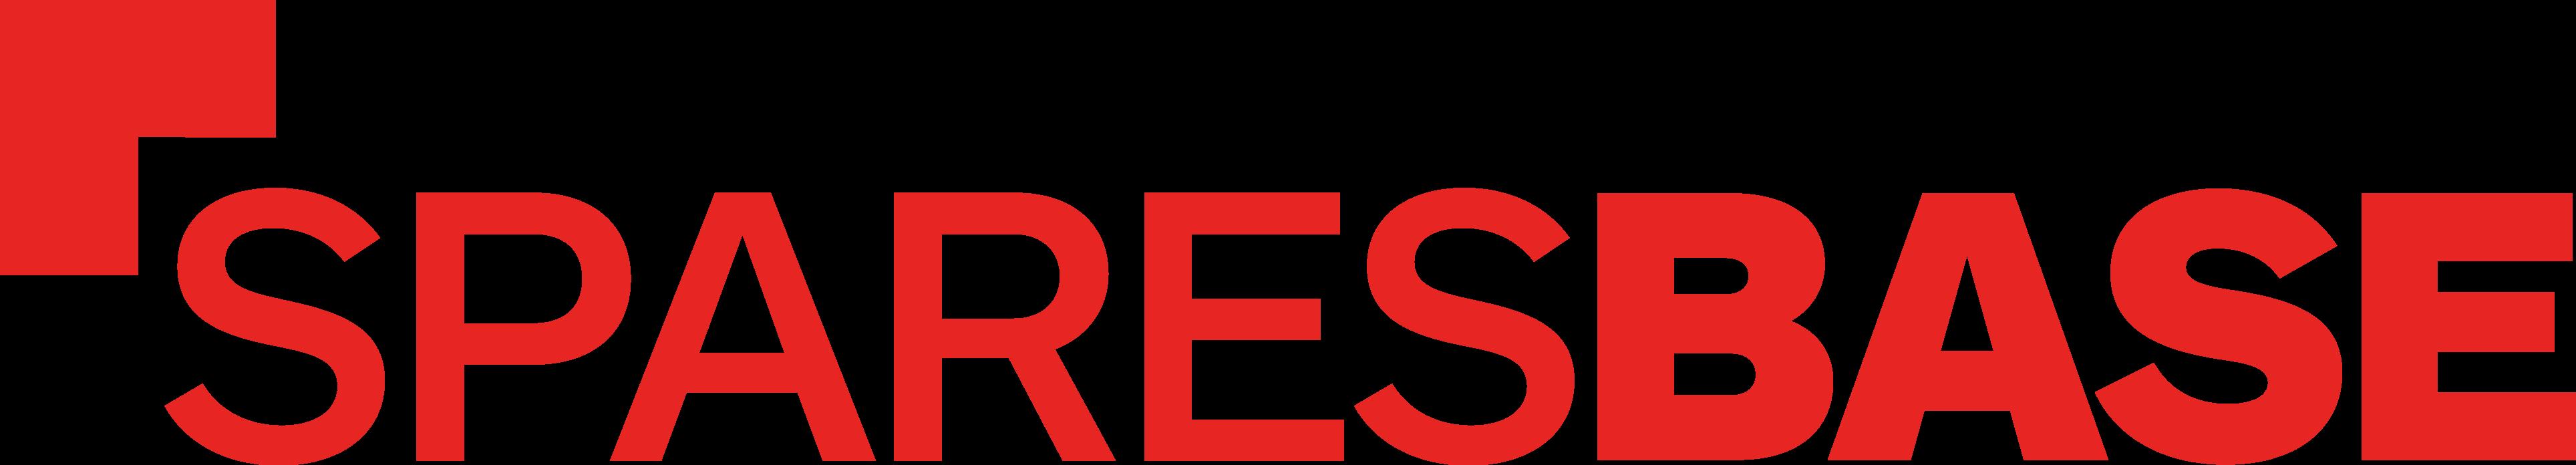 Sparesbase